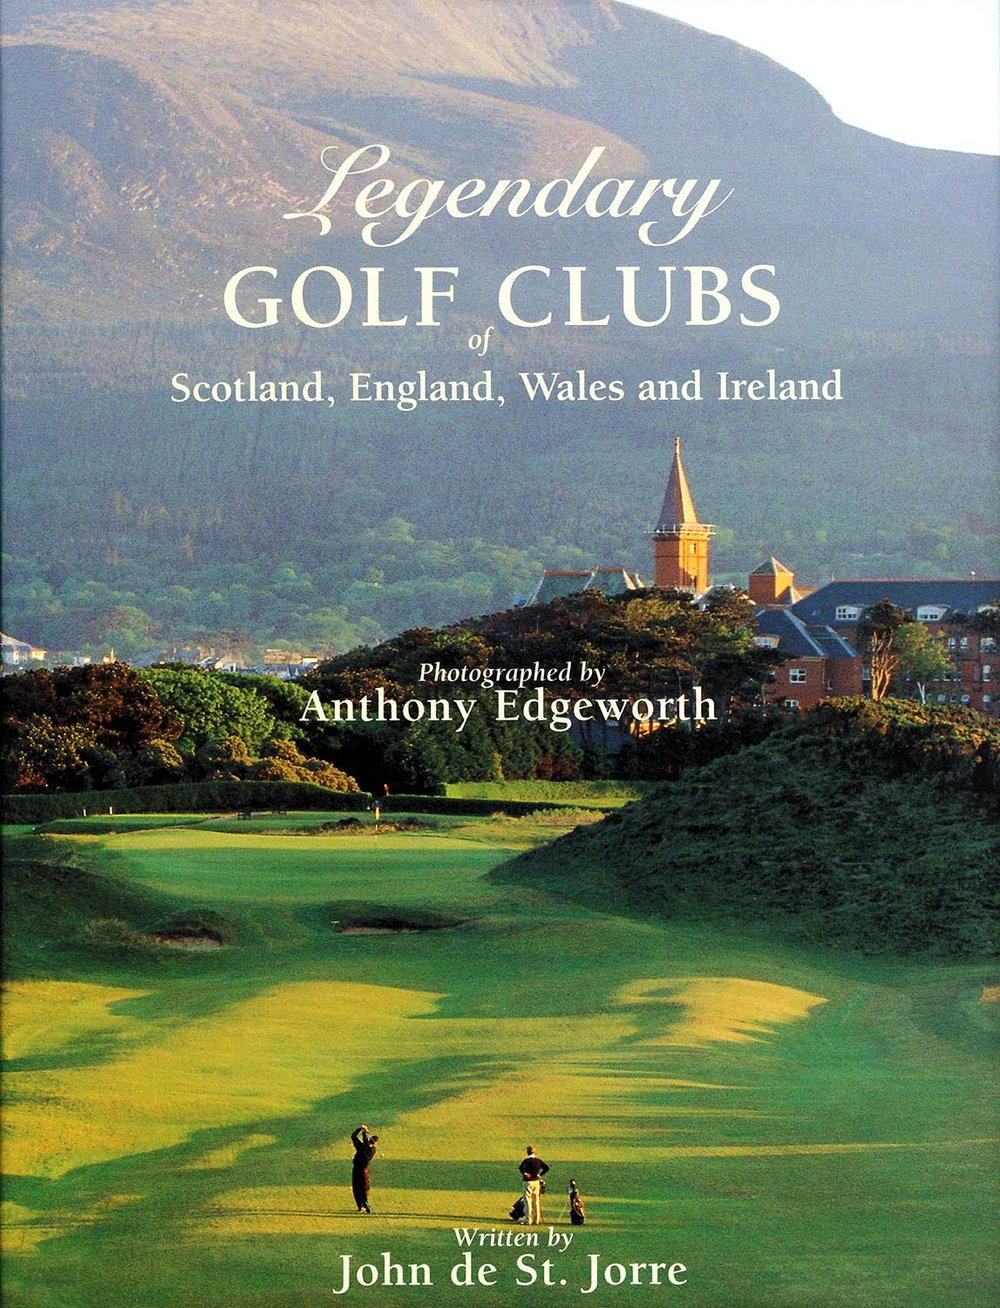 ee-book-covers-scotland-england-wales-ireland.jpg